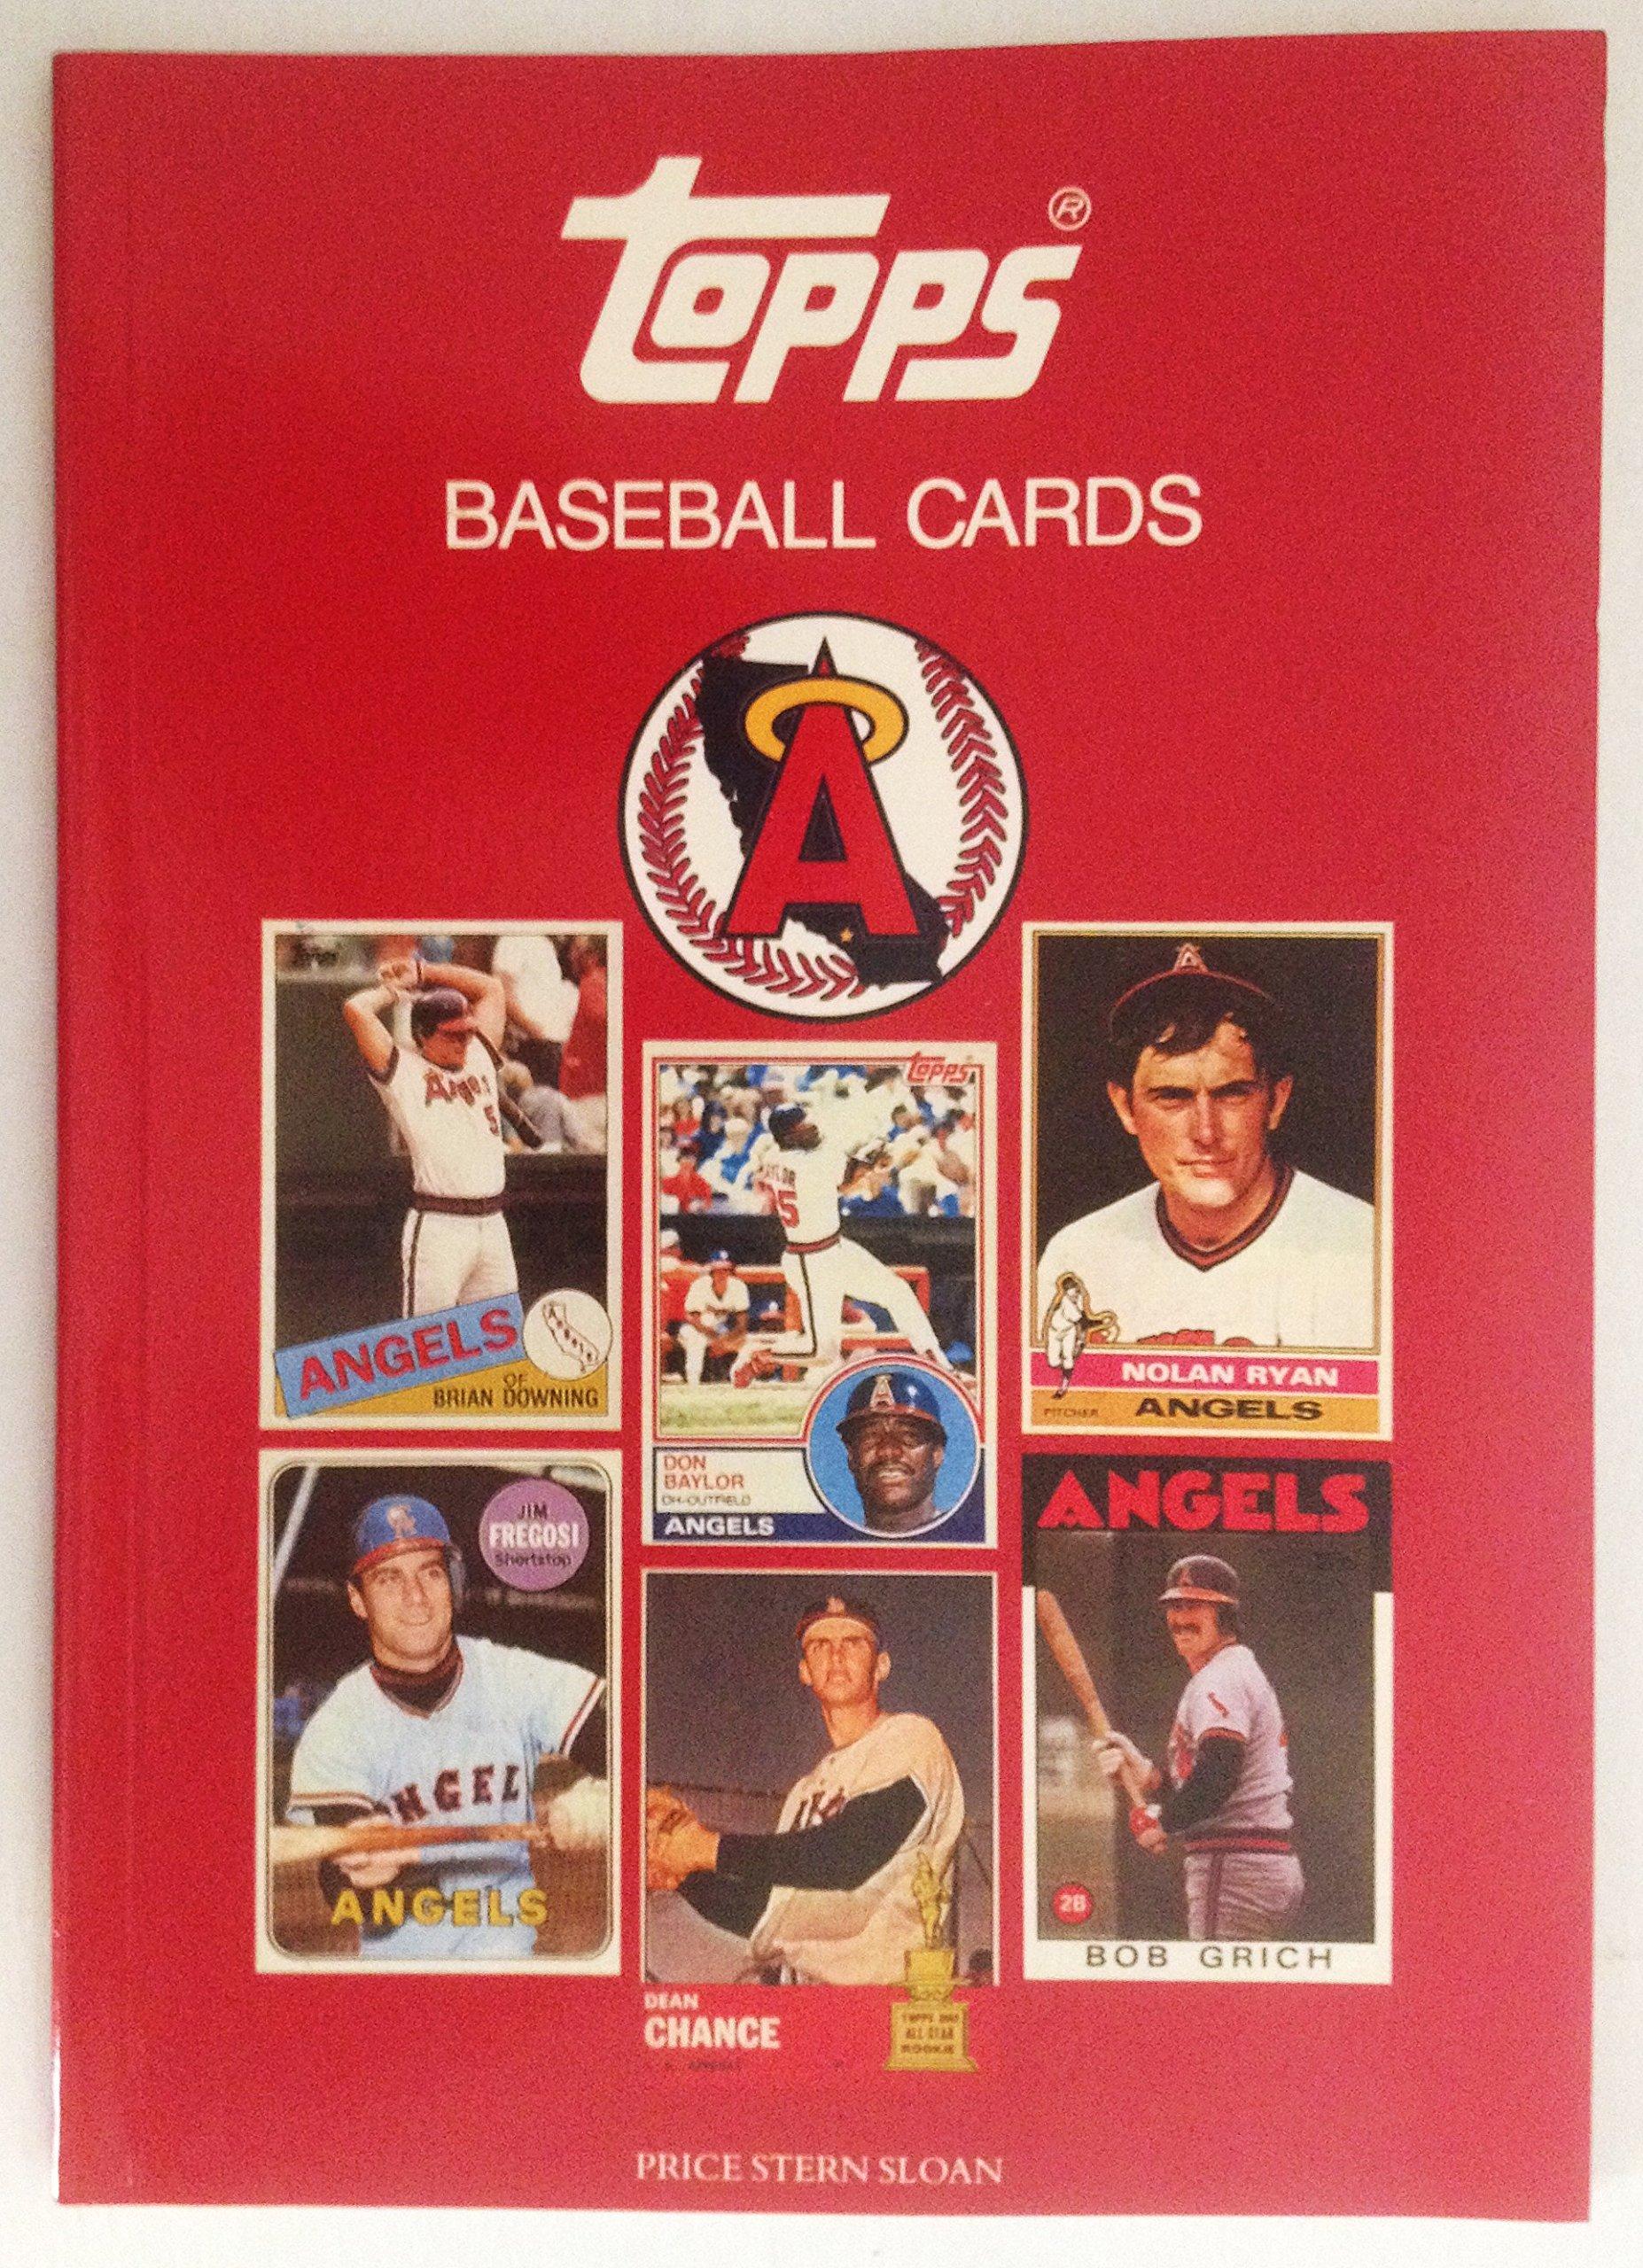 California Angels Topps Baseball Card Books 9780843156799